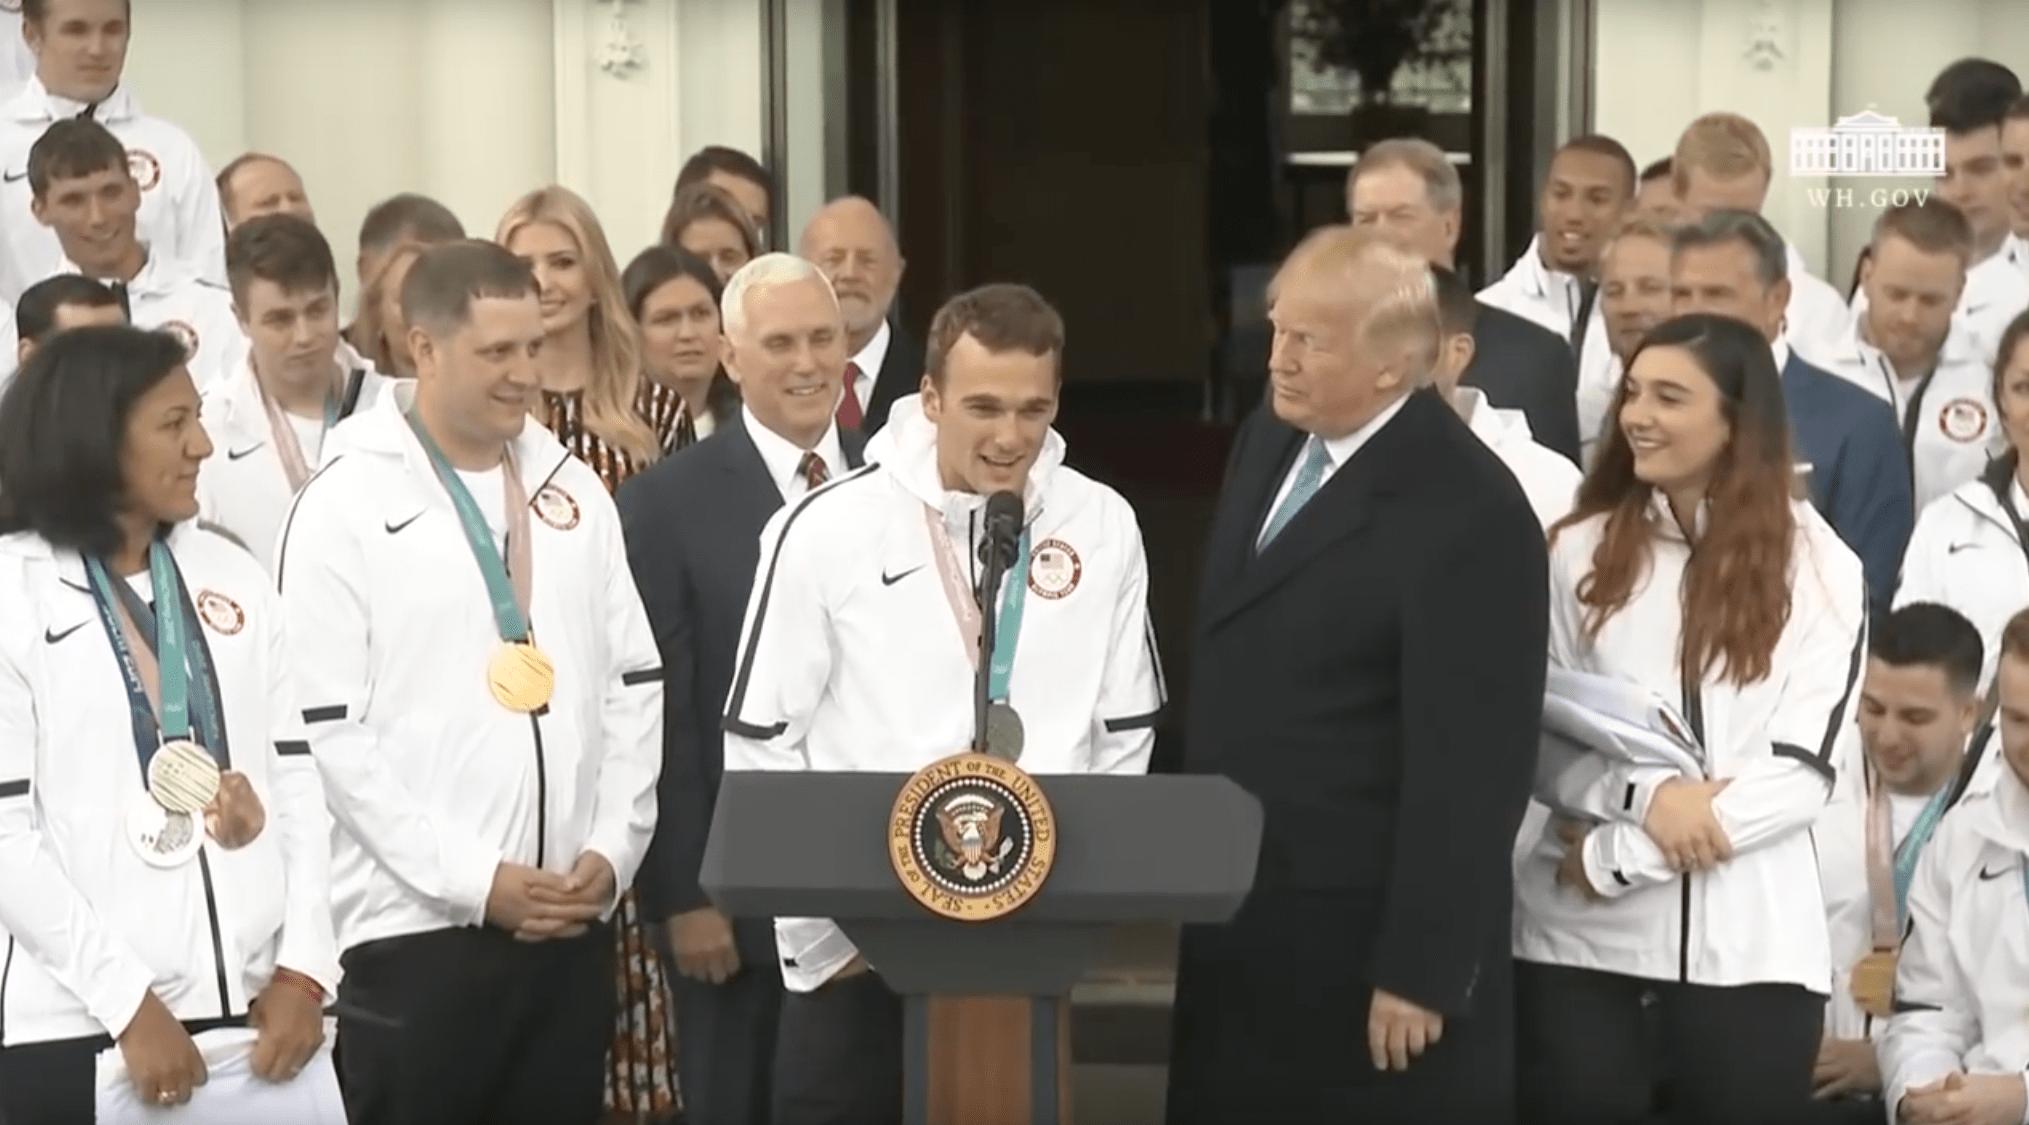 mark, nick groepeer, president, trump, White House, olympics, Pyeongchang